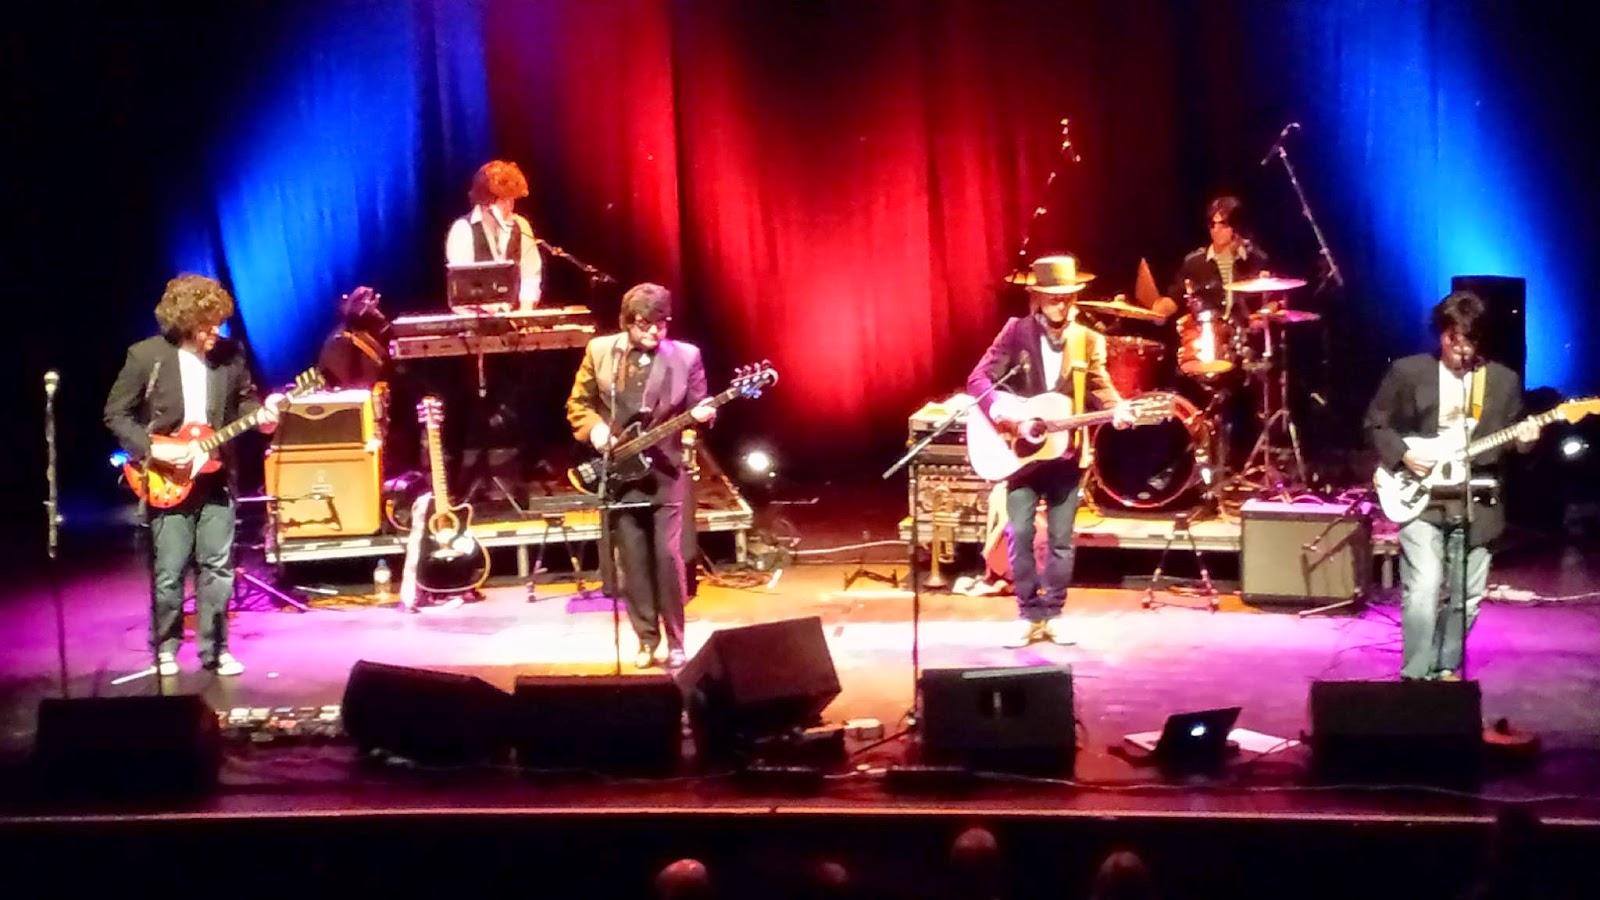 Roy Orbisob & the Travelling Wilburys